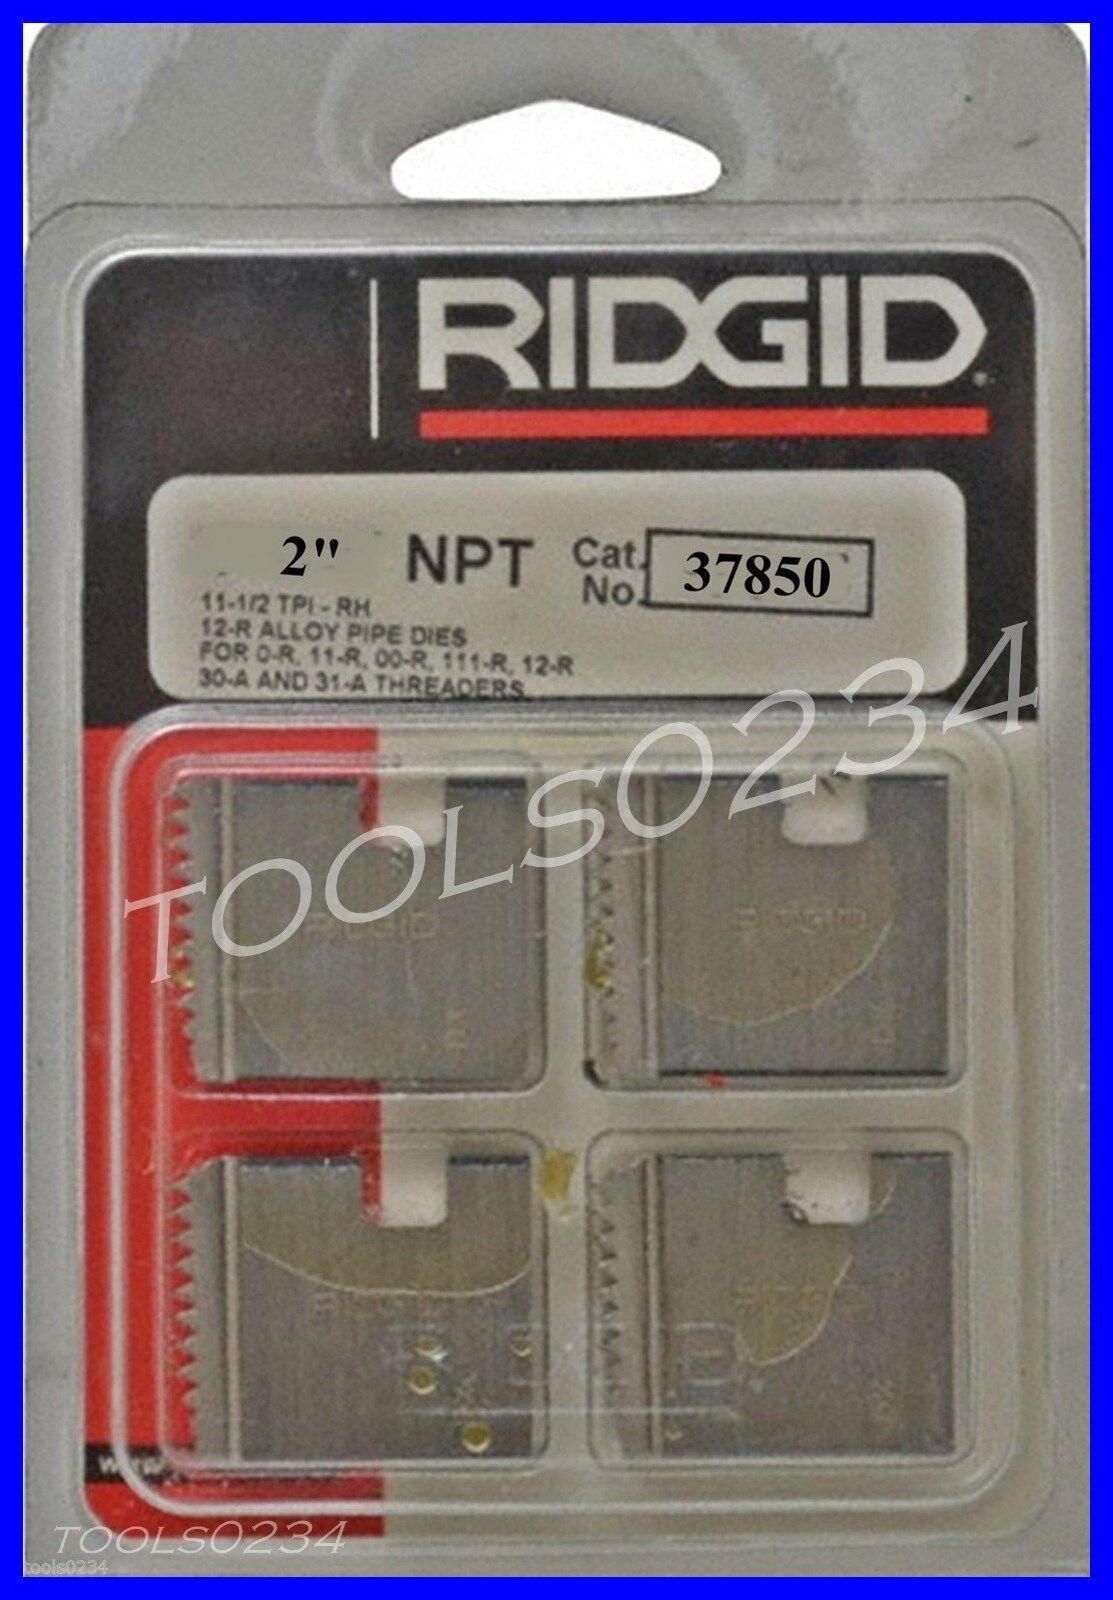 Ridgid 37850 Pipe Threading Dies SET 2